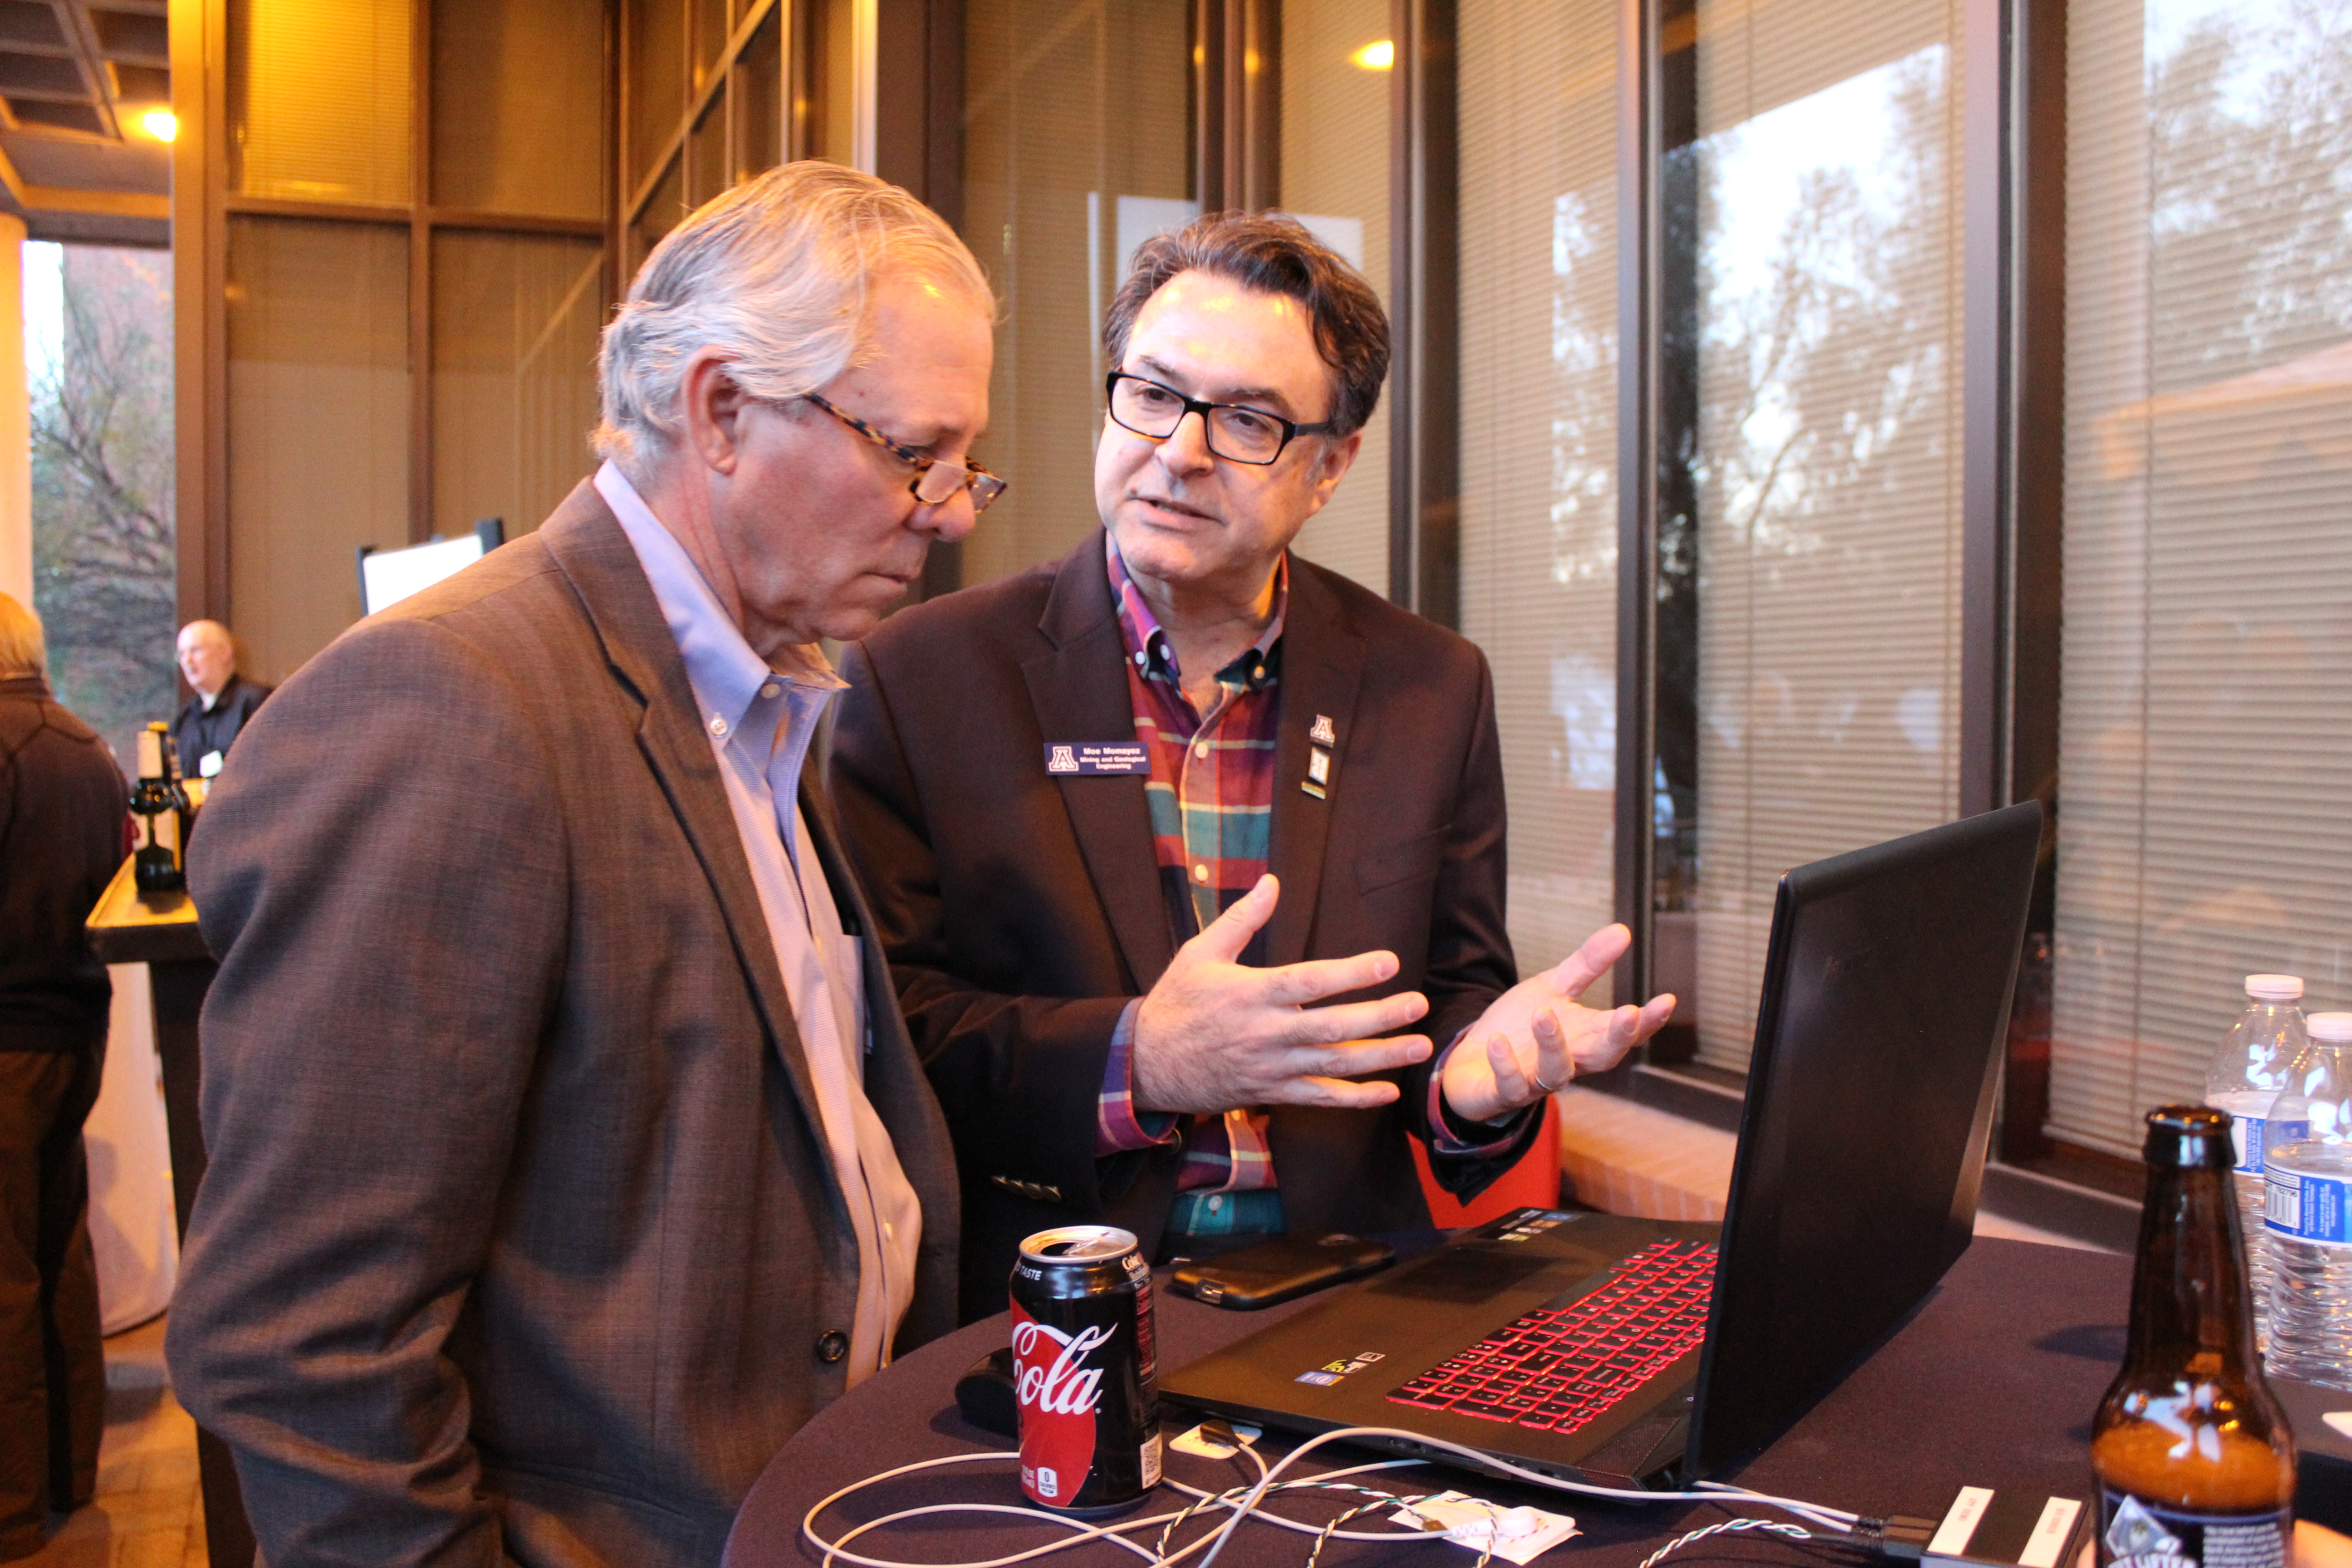 UA President Robert C. Robbins  talks with professor Moe Momayez about the mining sensor network Momayez developed and is bringing to market via the startup Guia.